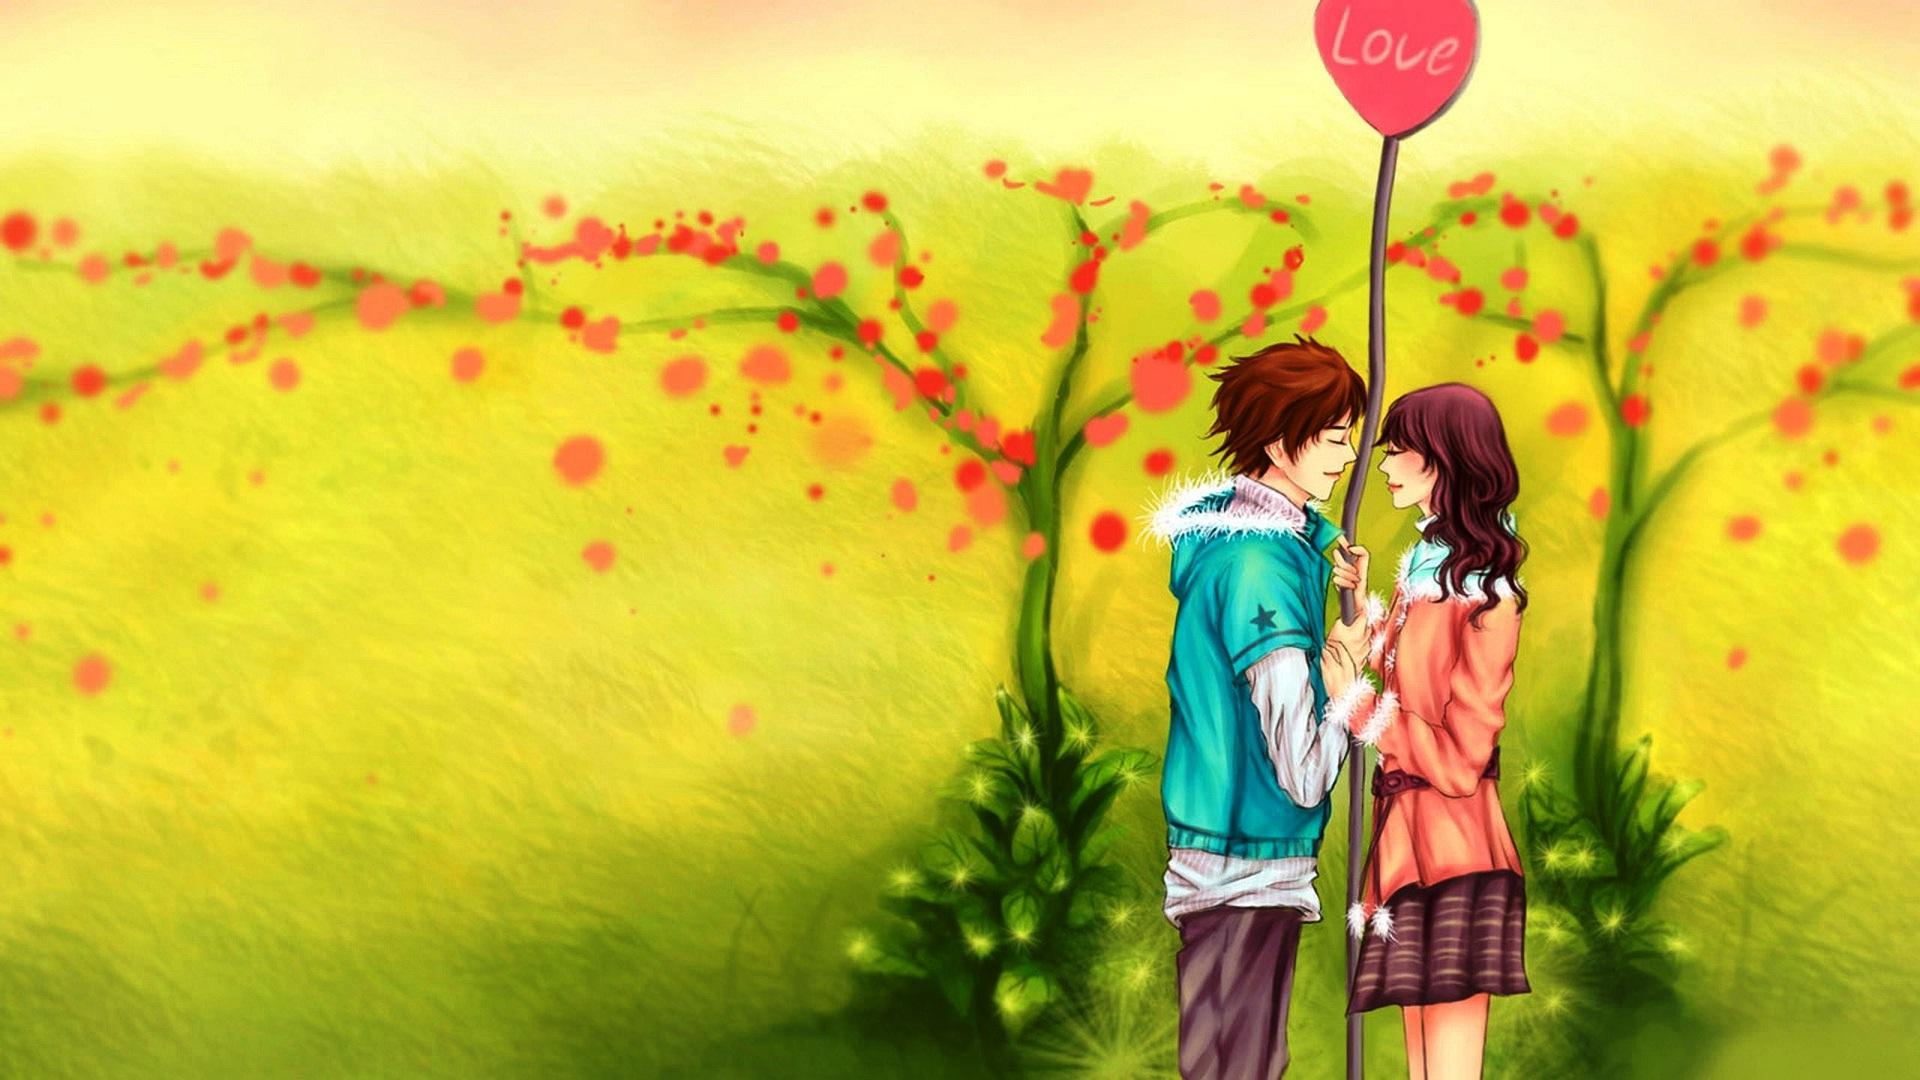 Romantic Couple Hd Wallpaper Free Download 1920 X Lovers Hd